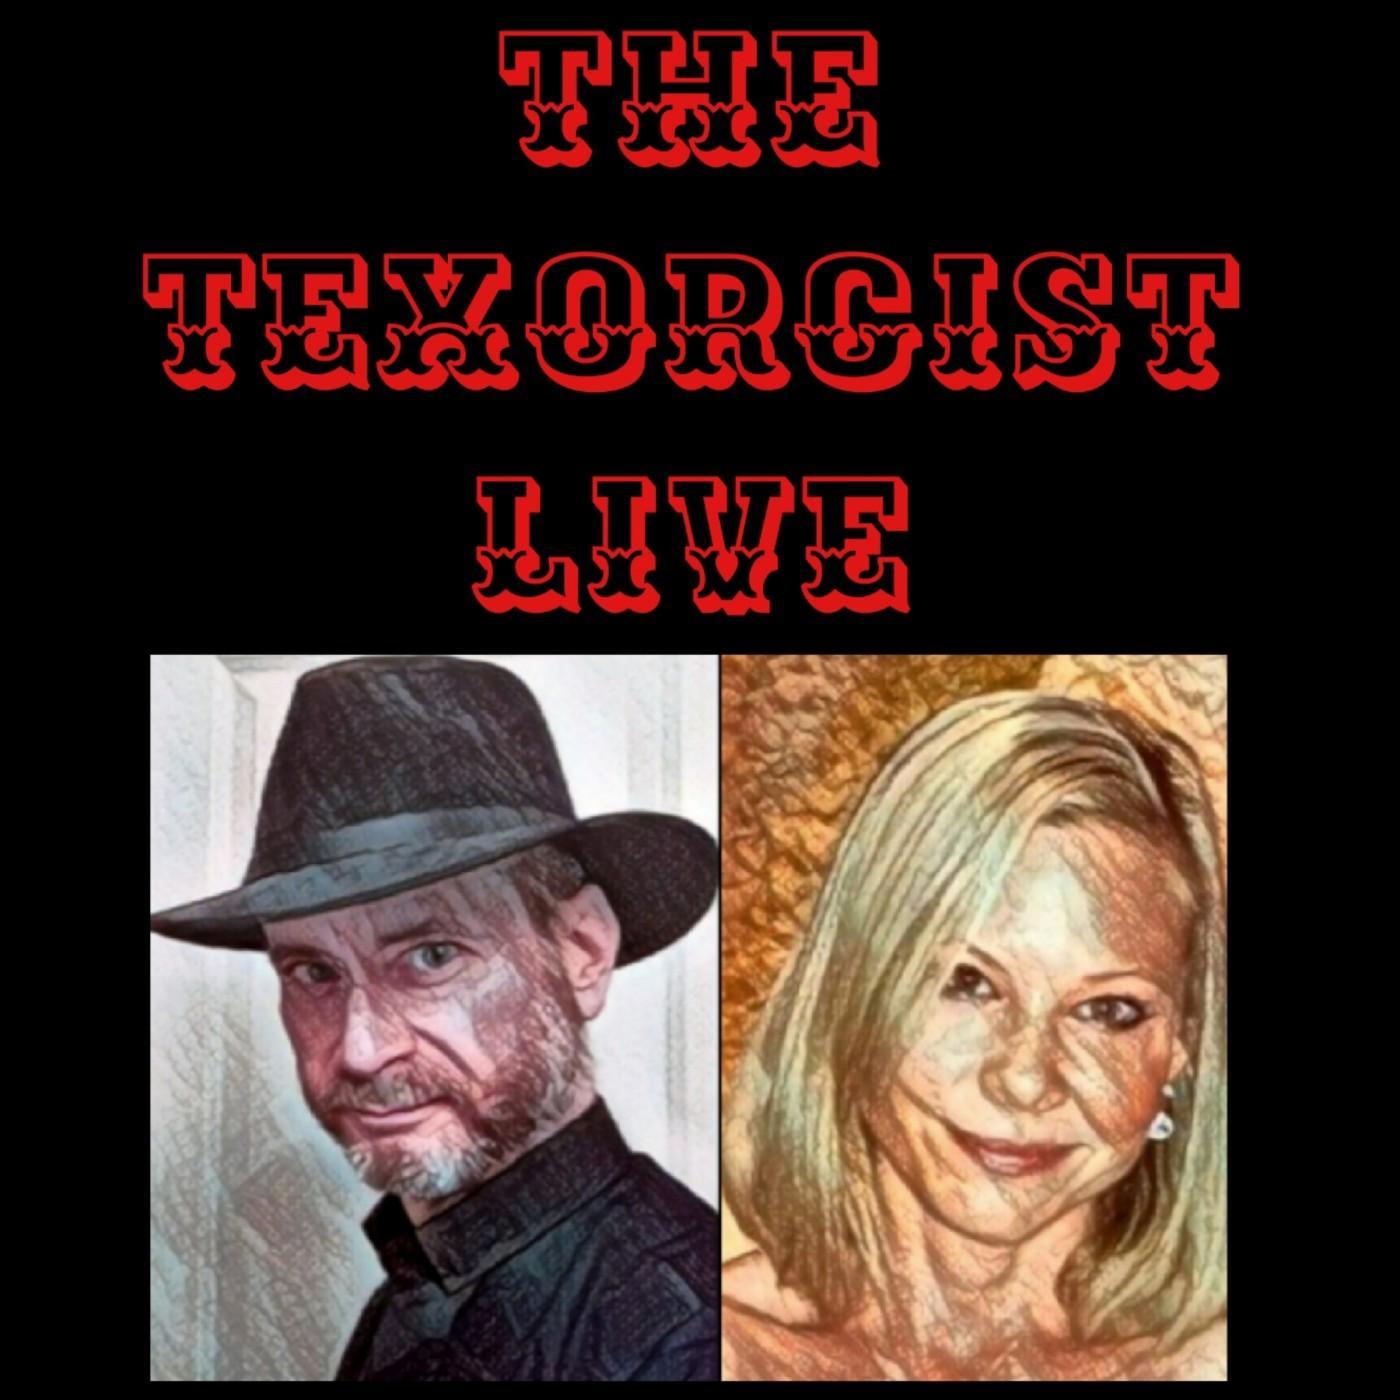 The Texorcist Live (podcast) - The Texorcist LIVE | Listen Notes